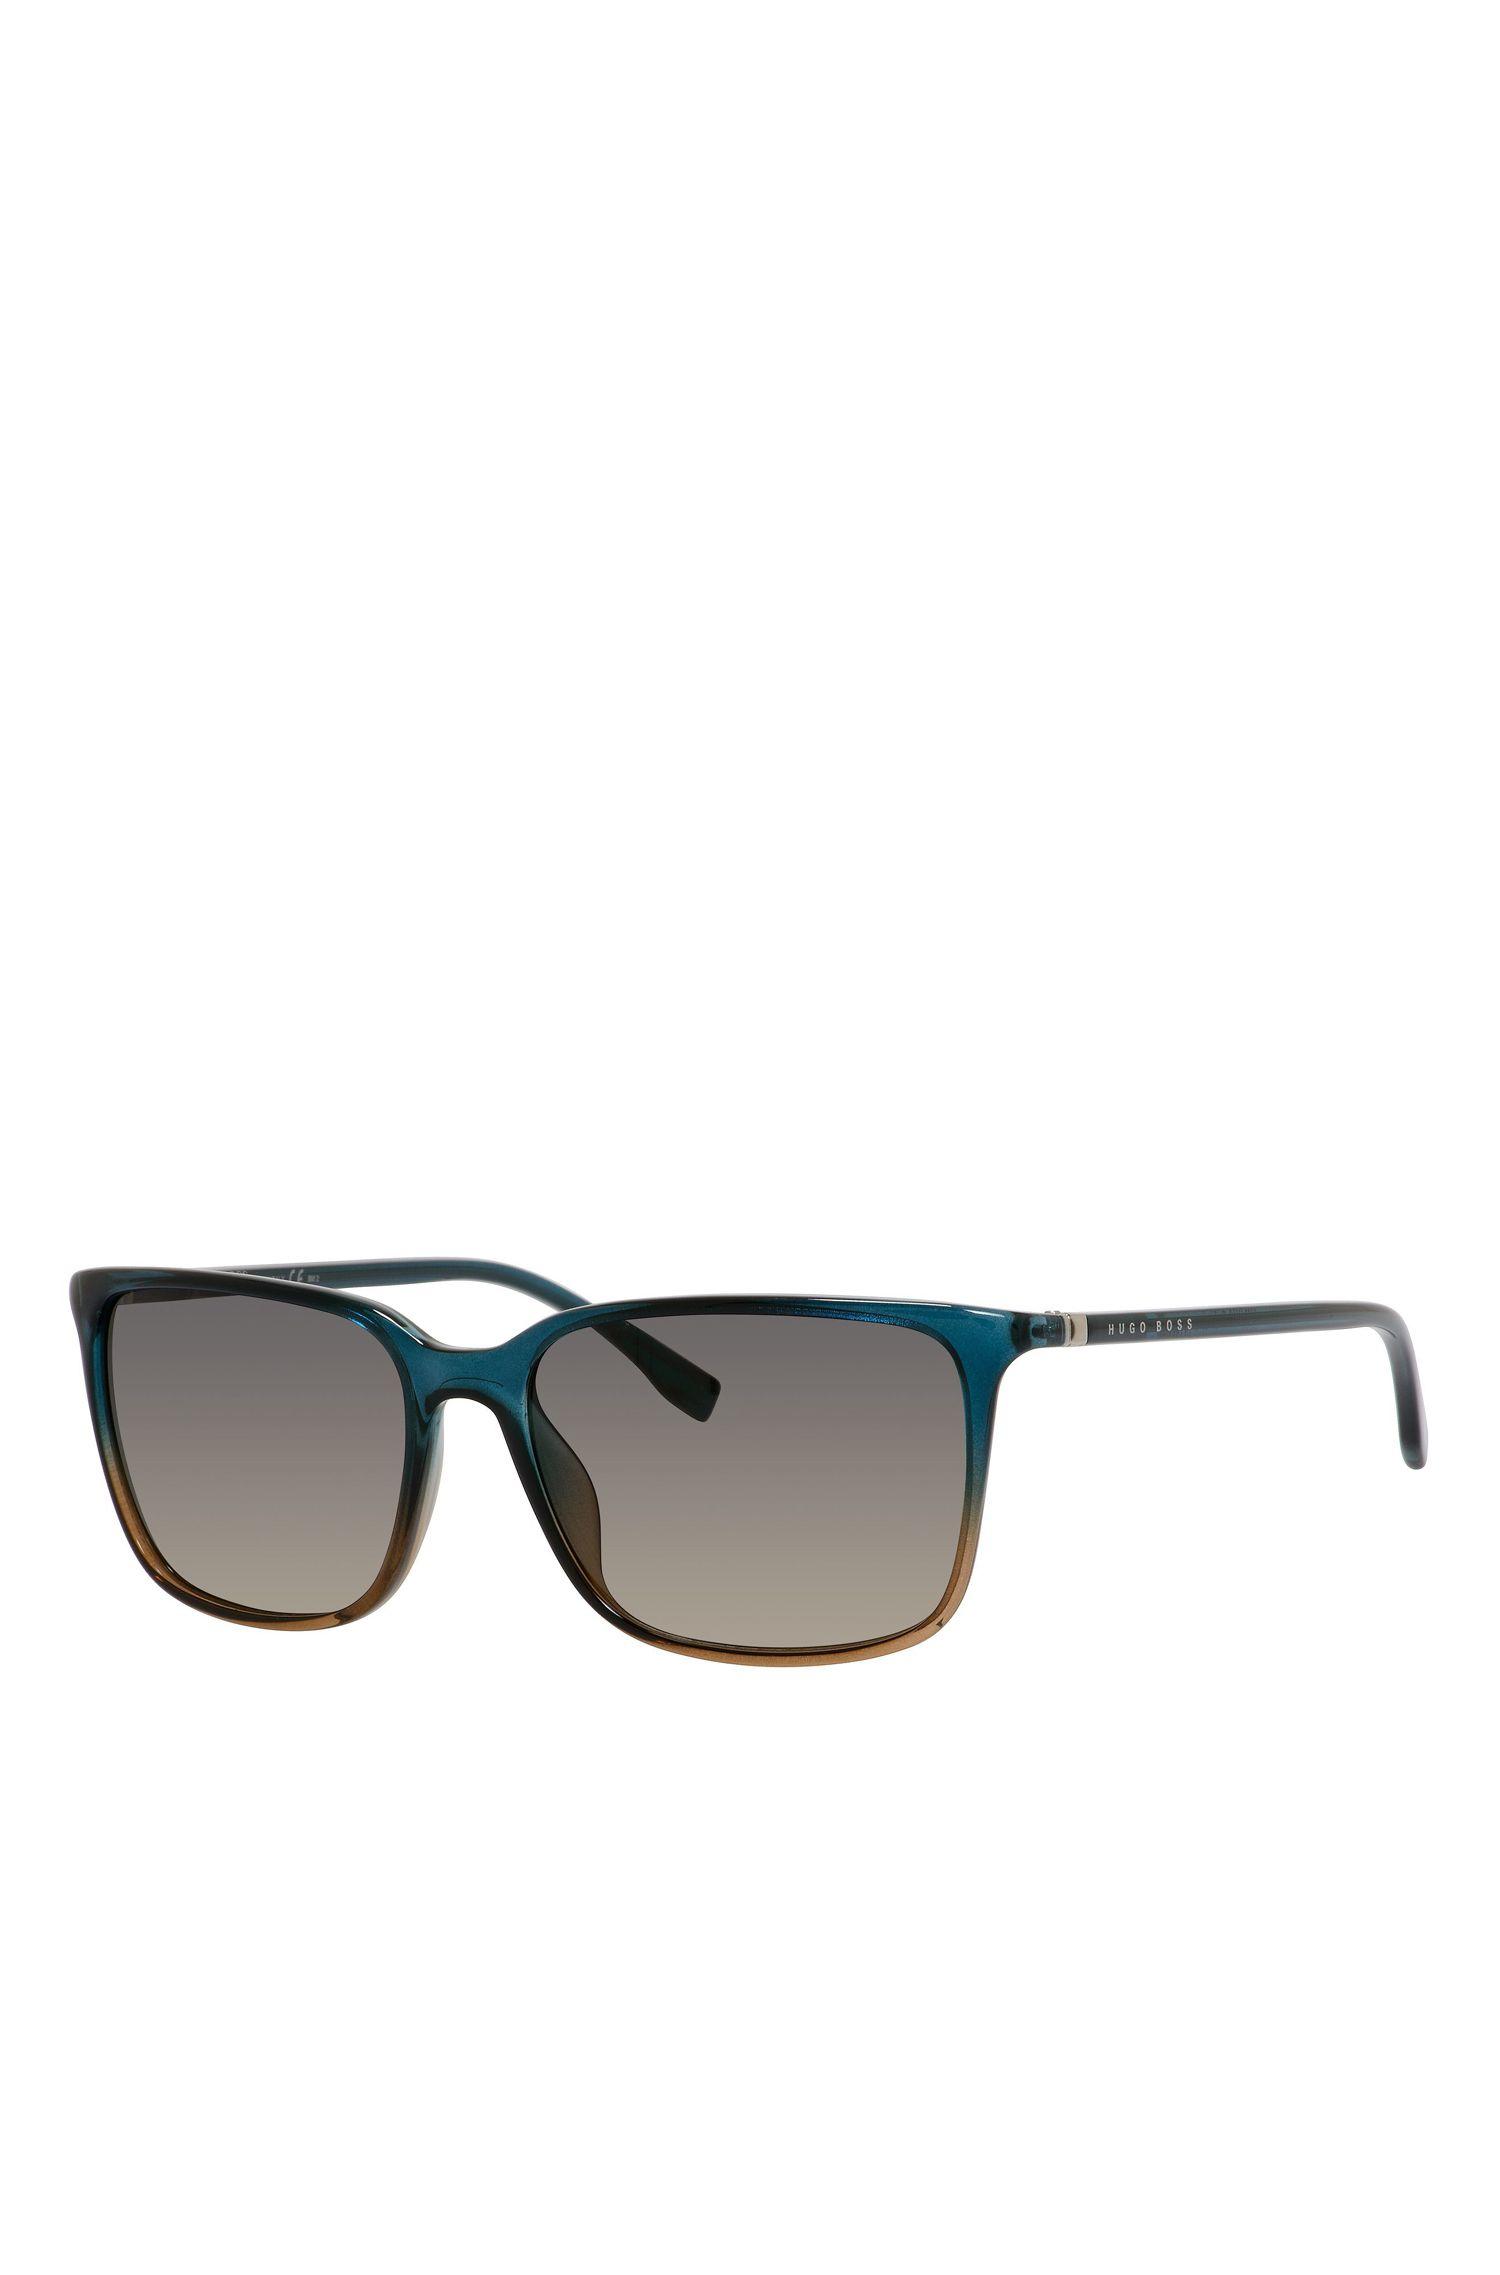 Gradient Lens Rectangular Sunglasses | BOSS 0666S, Assorted-Pre-Pack